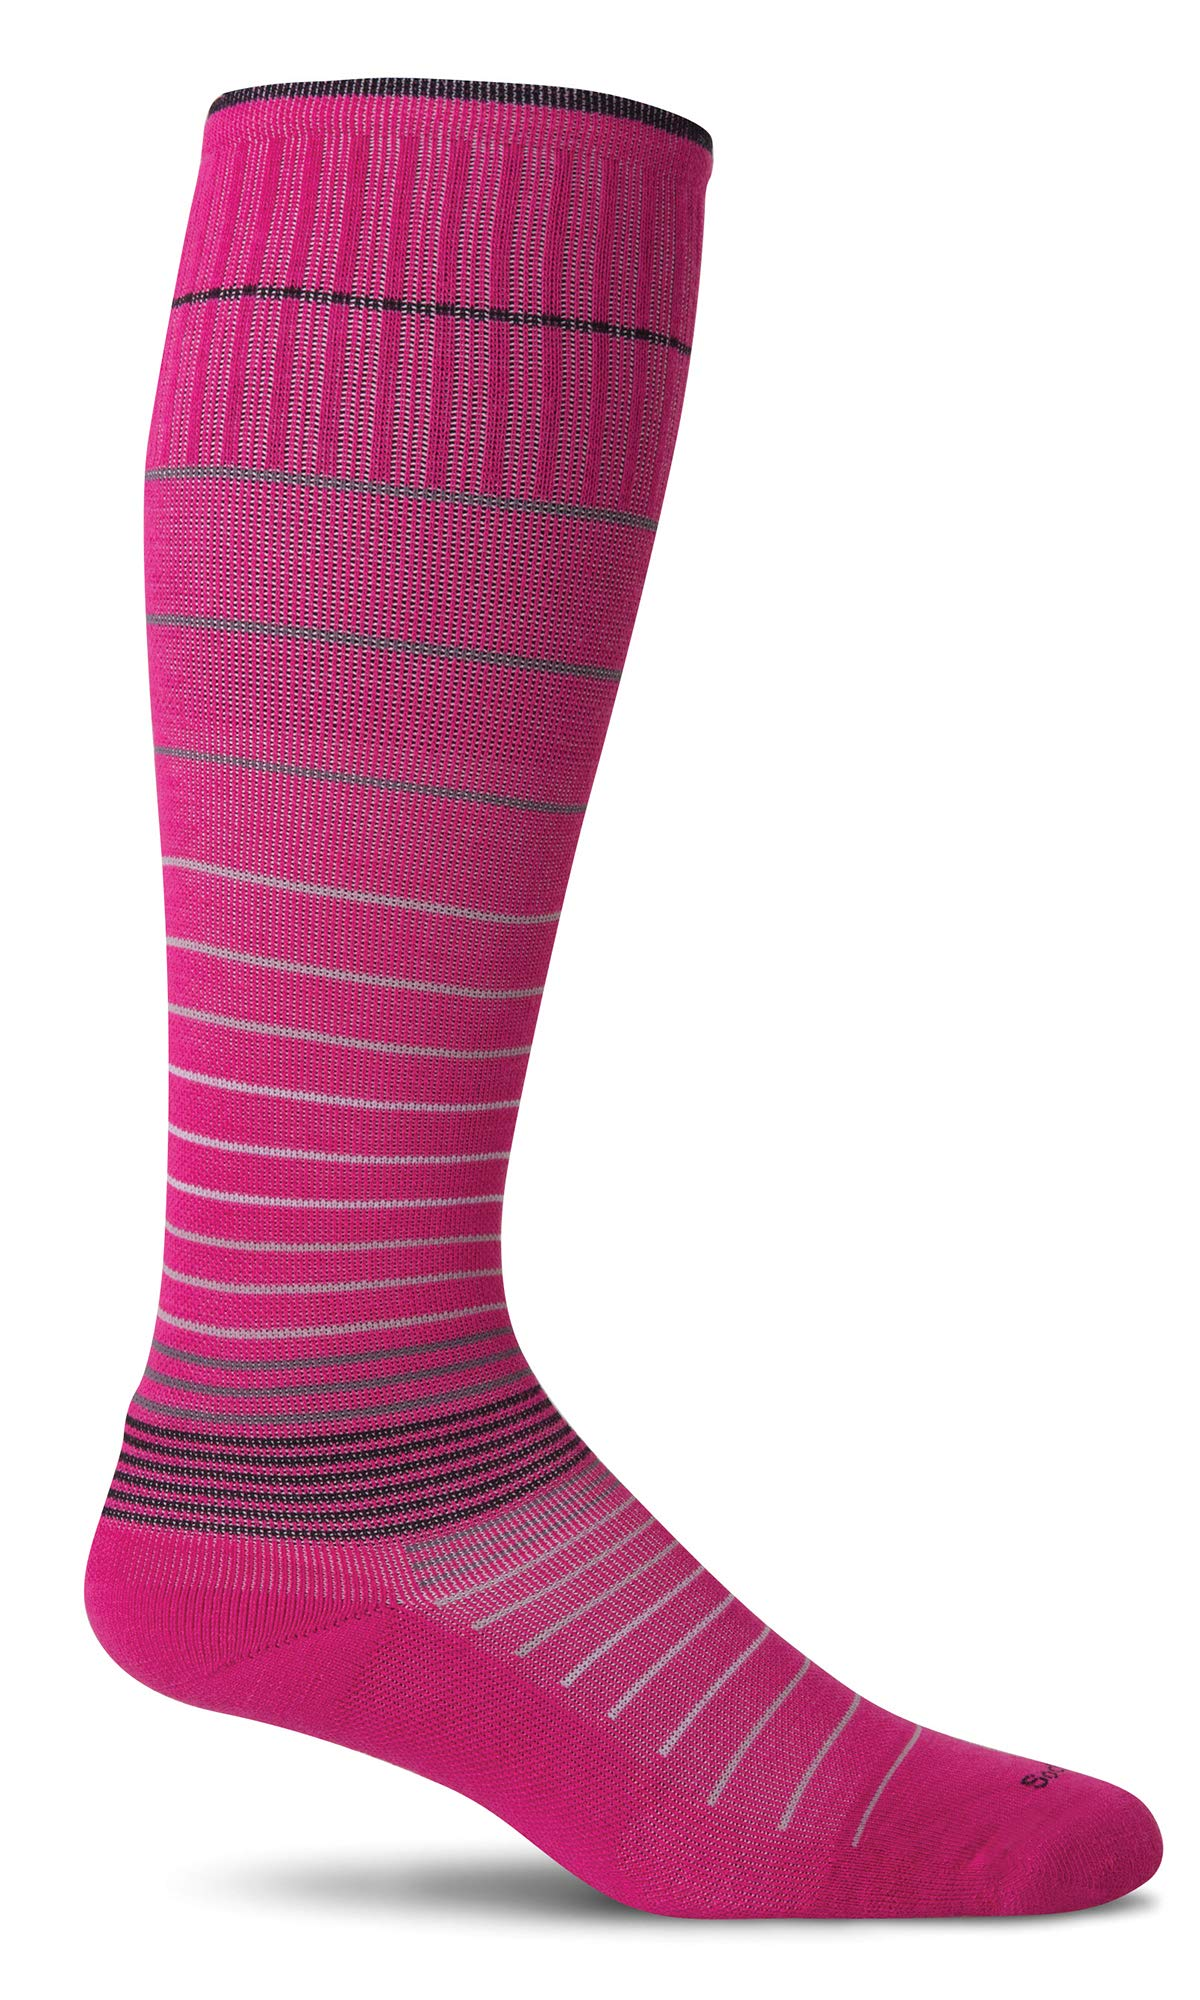 Sockwell Women's Circulator Graduated Compression Socks, Small/Medium (4-7.5) Azalea